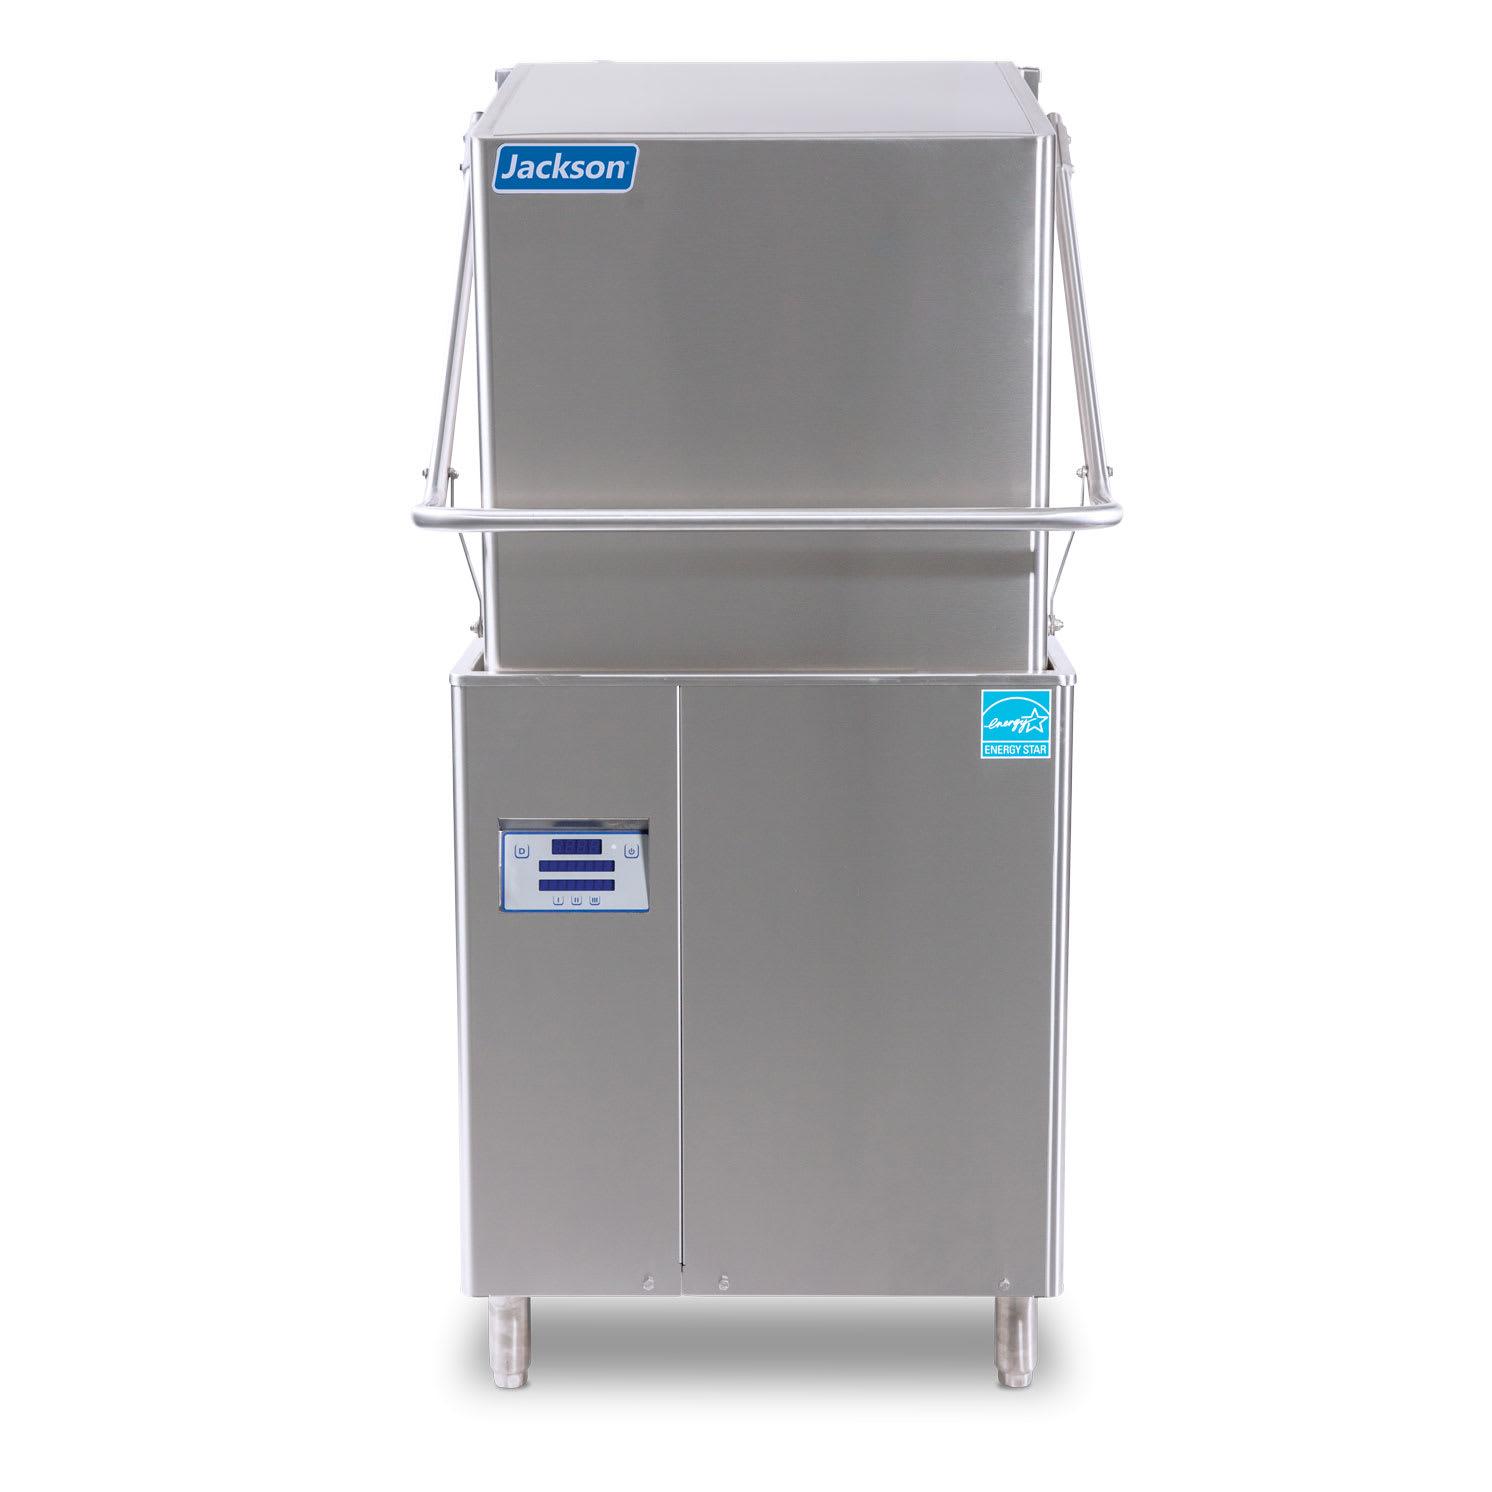 Jackson DYNATEMP Electric High Temp Door-Type Dishwasher w/ Booster Heater, 230v/1ph